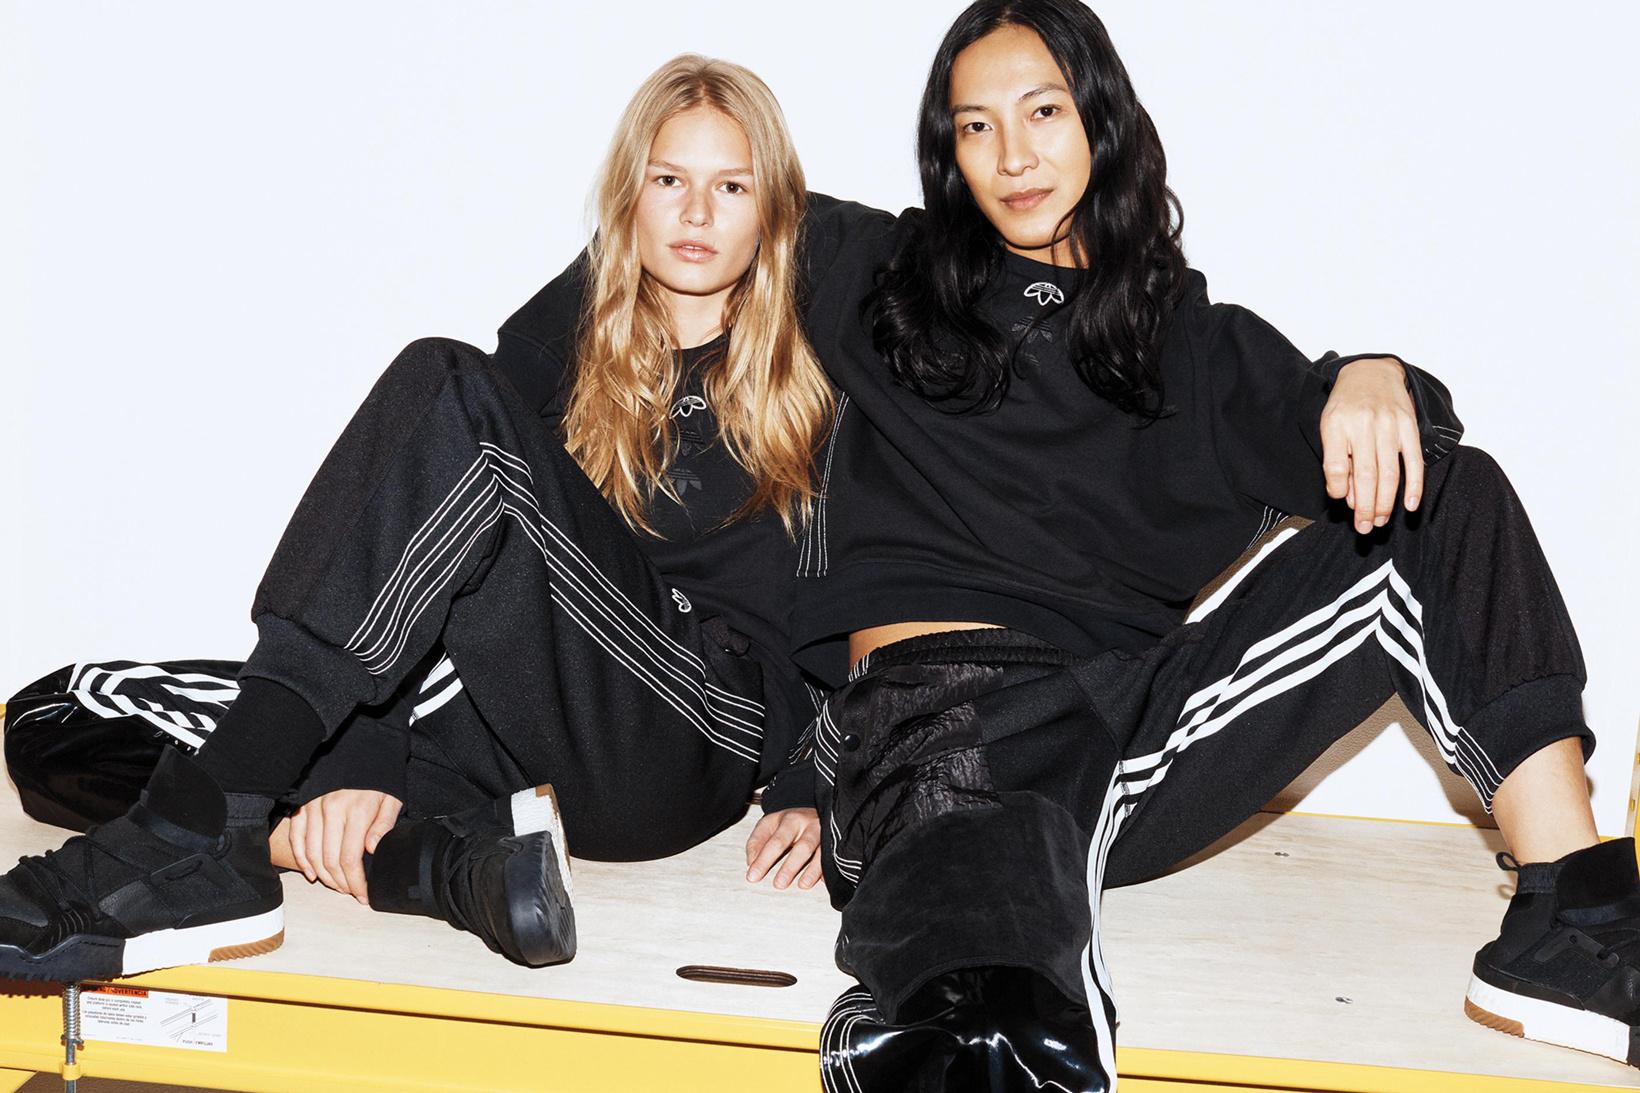 alexander-wang-adidas-originals-join-forces-second-drop-2017-spring-1.jpg